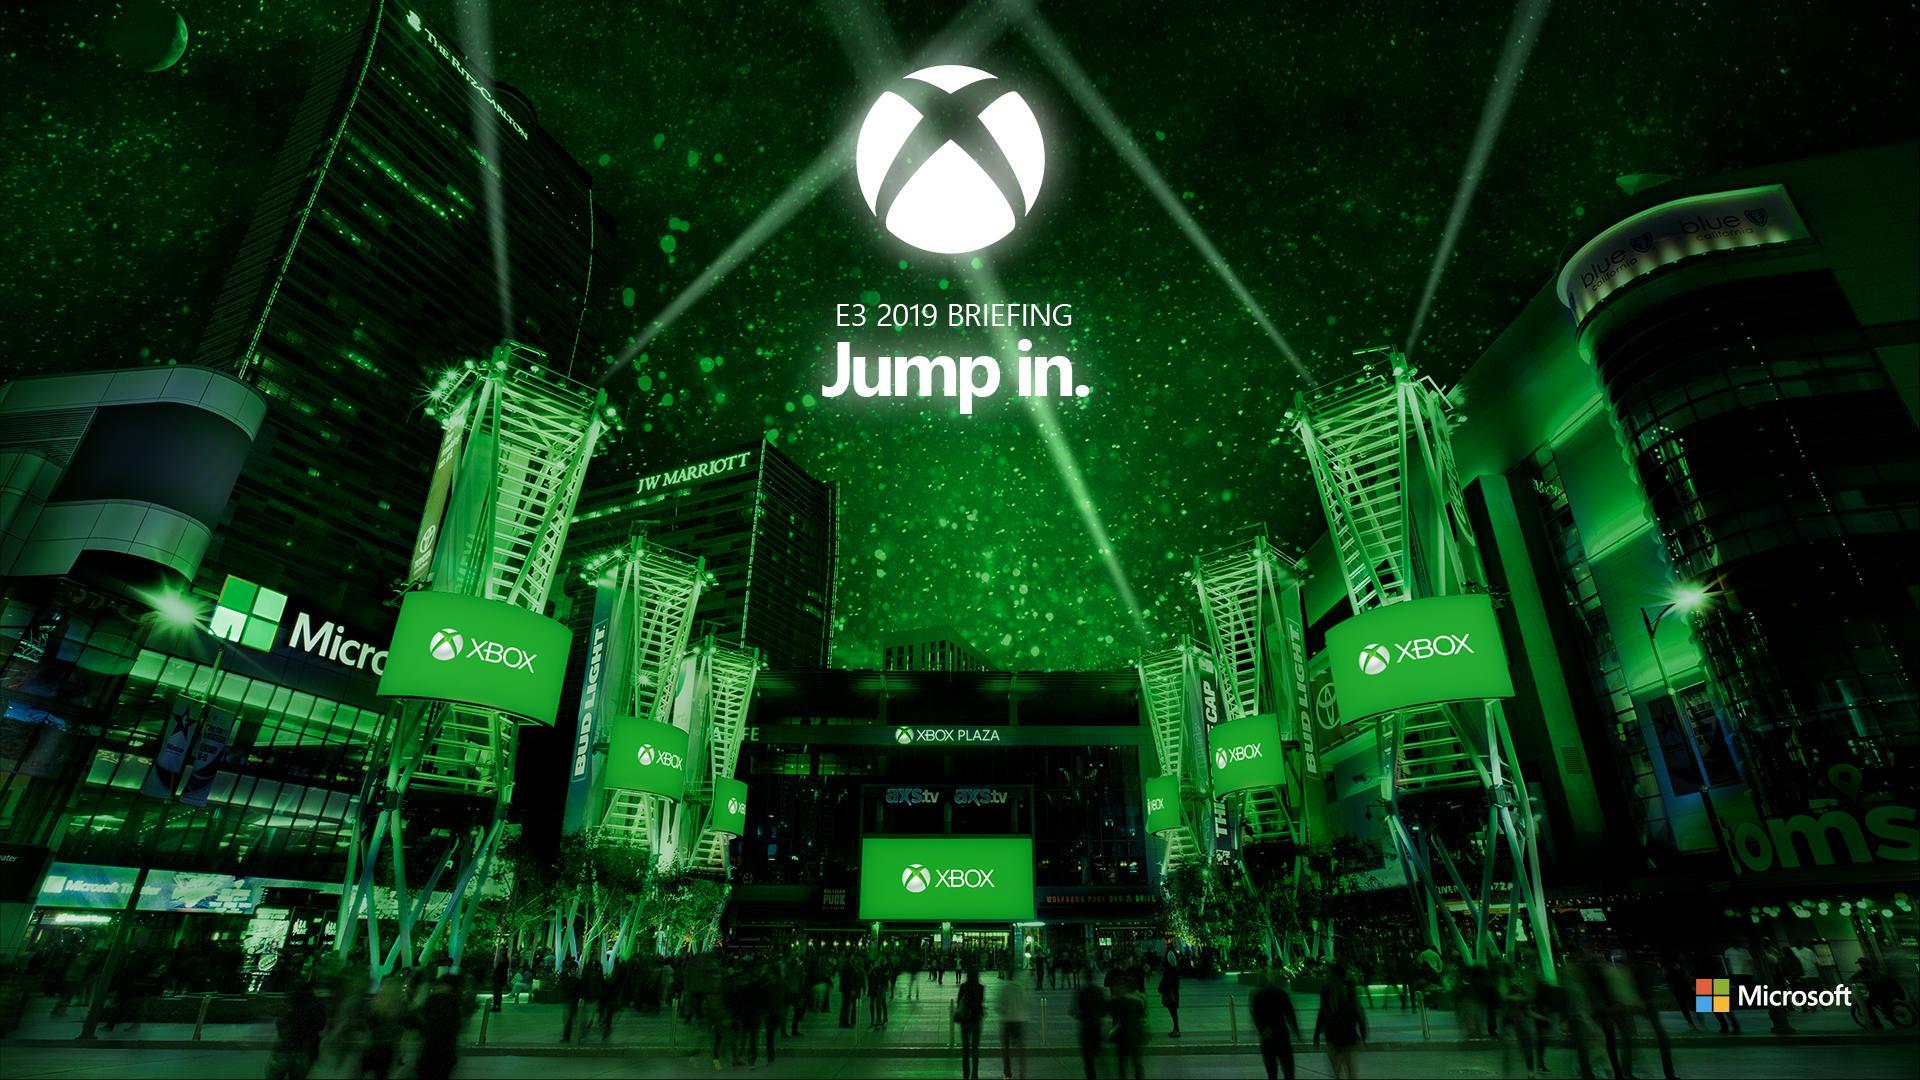 Е3 2019: пресс-конференция Microsoft пройдёт 9 июня